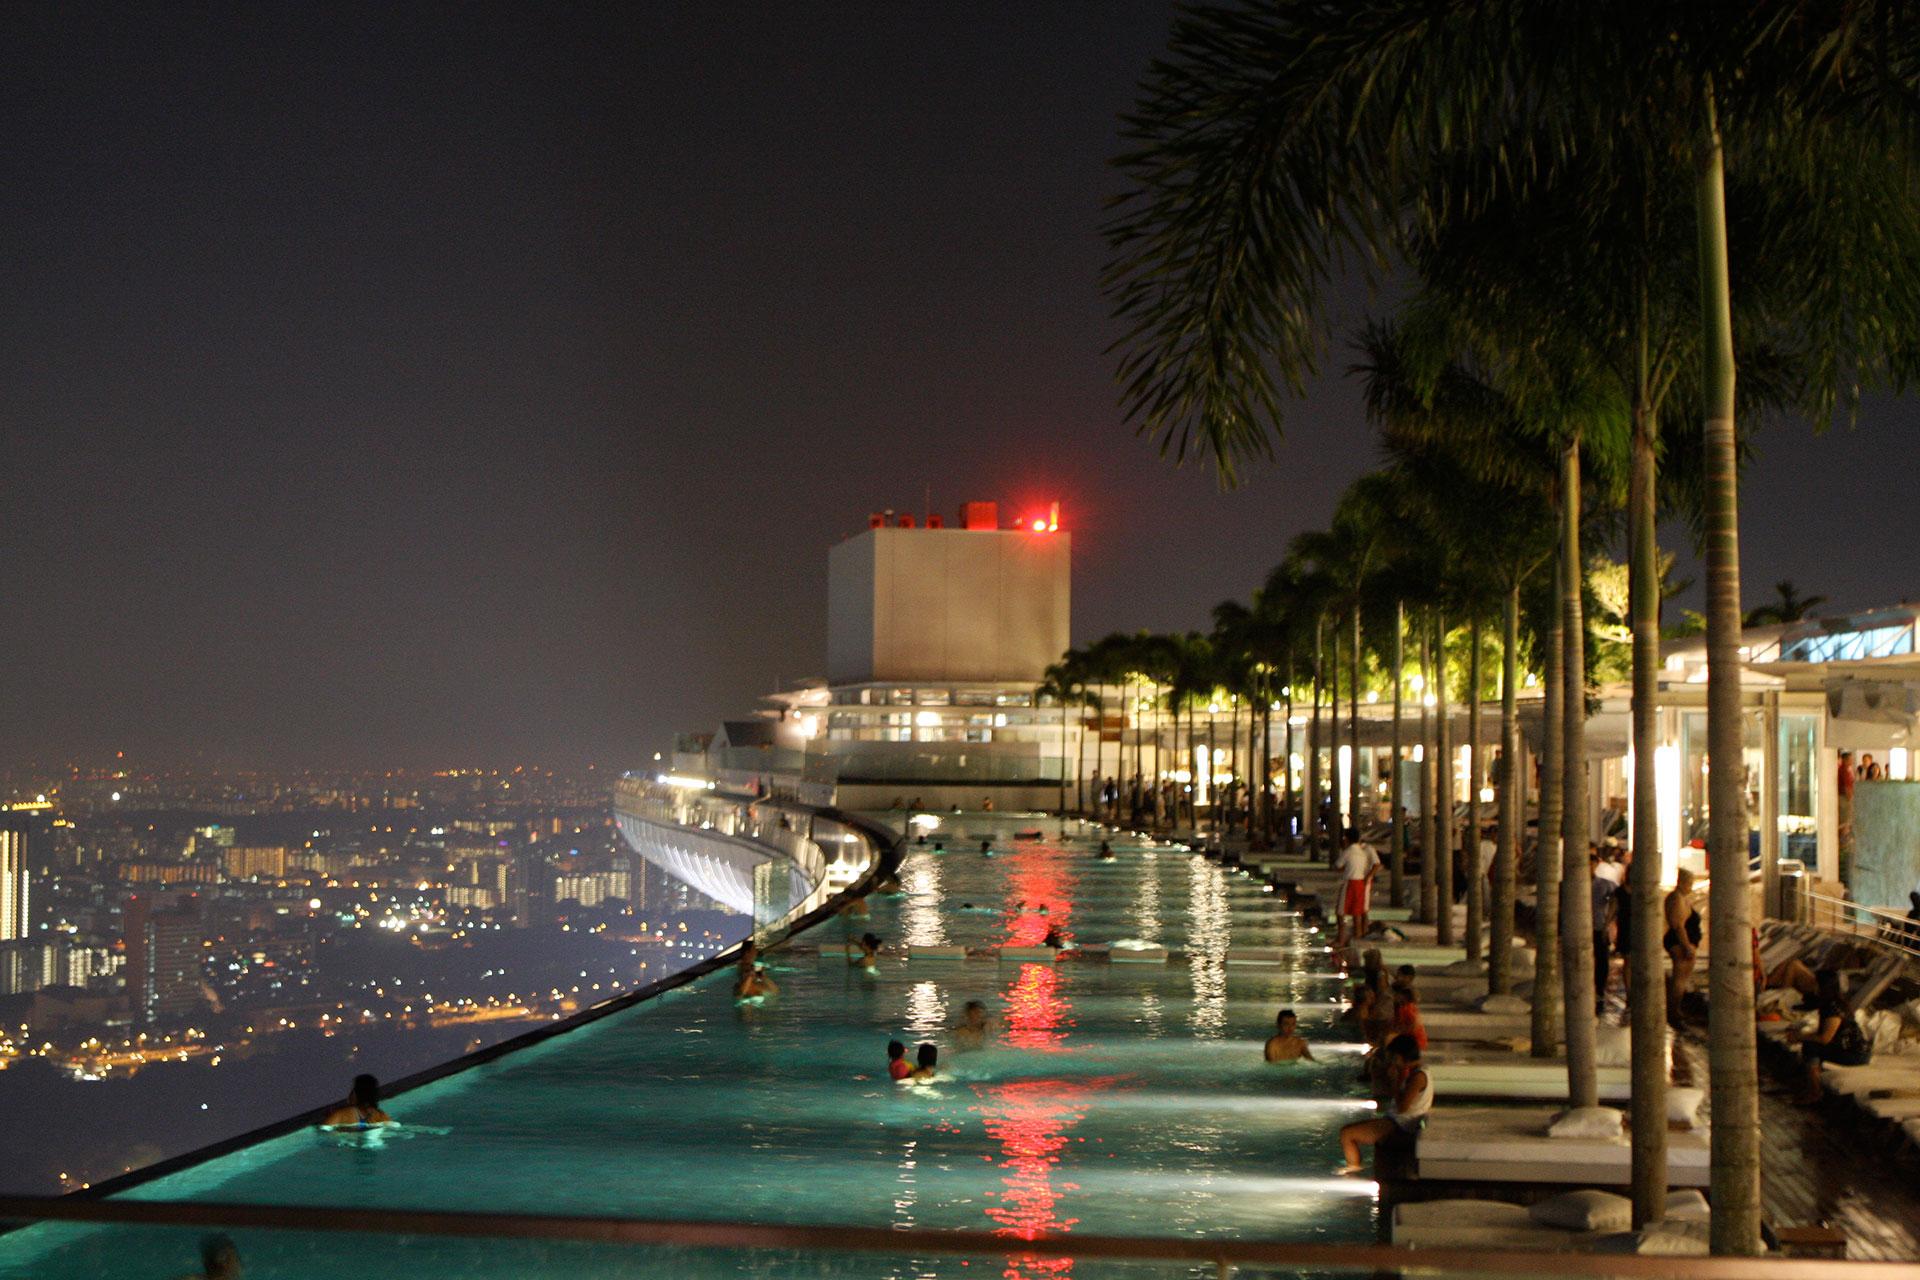 Infinity Pool of Marina Bay Sands, Singapore